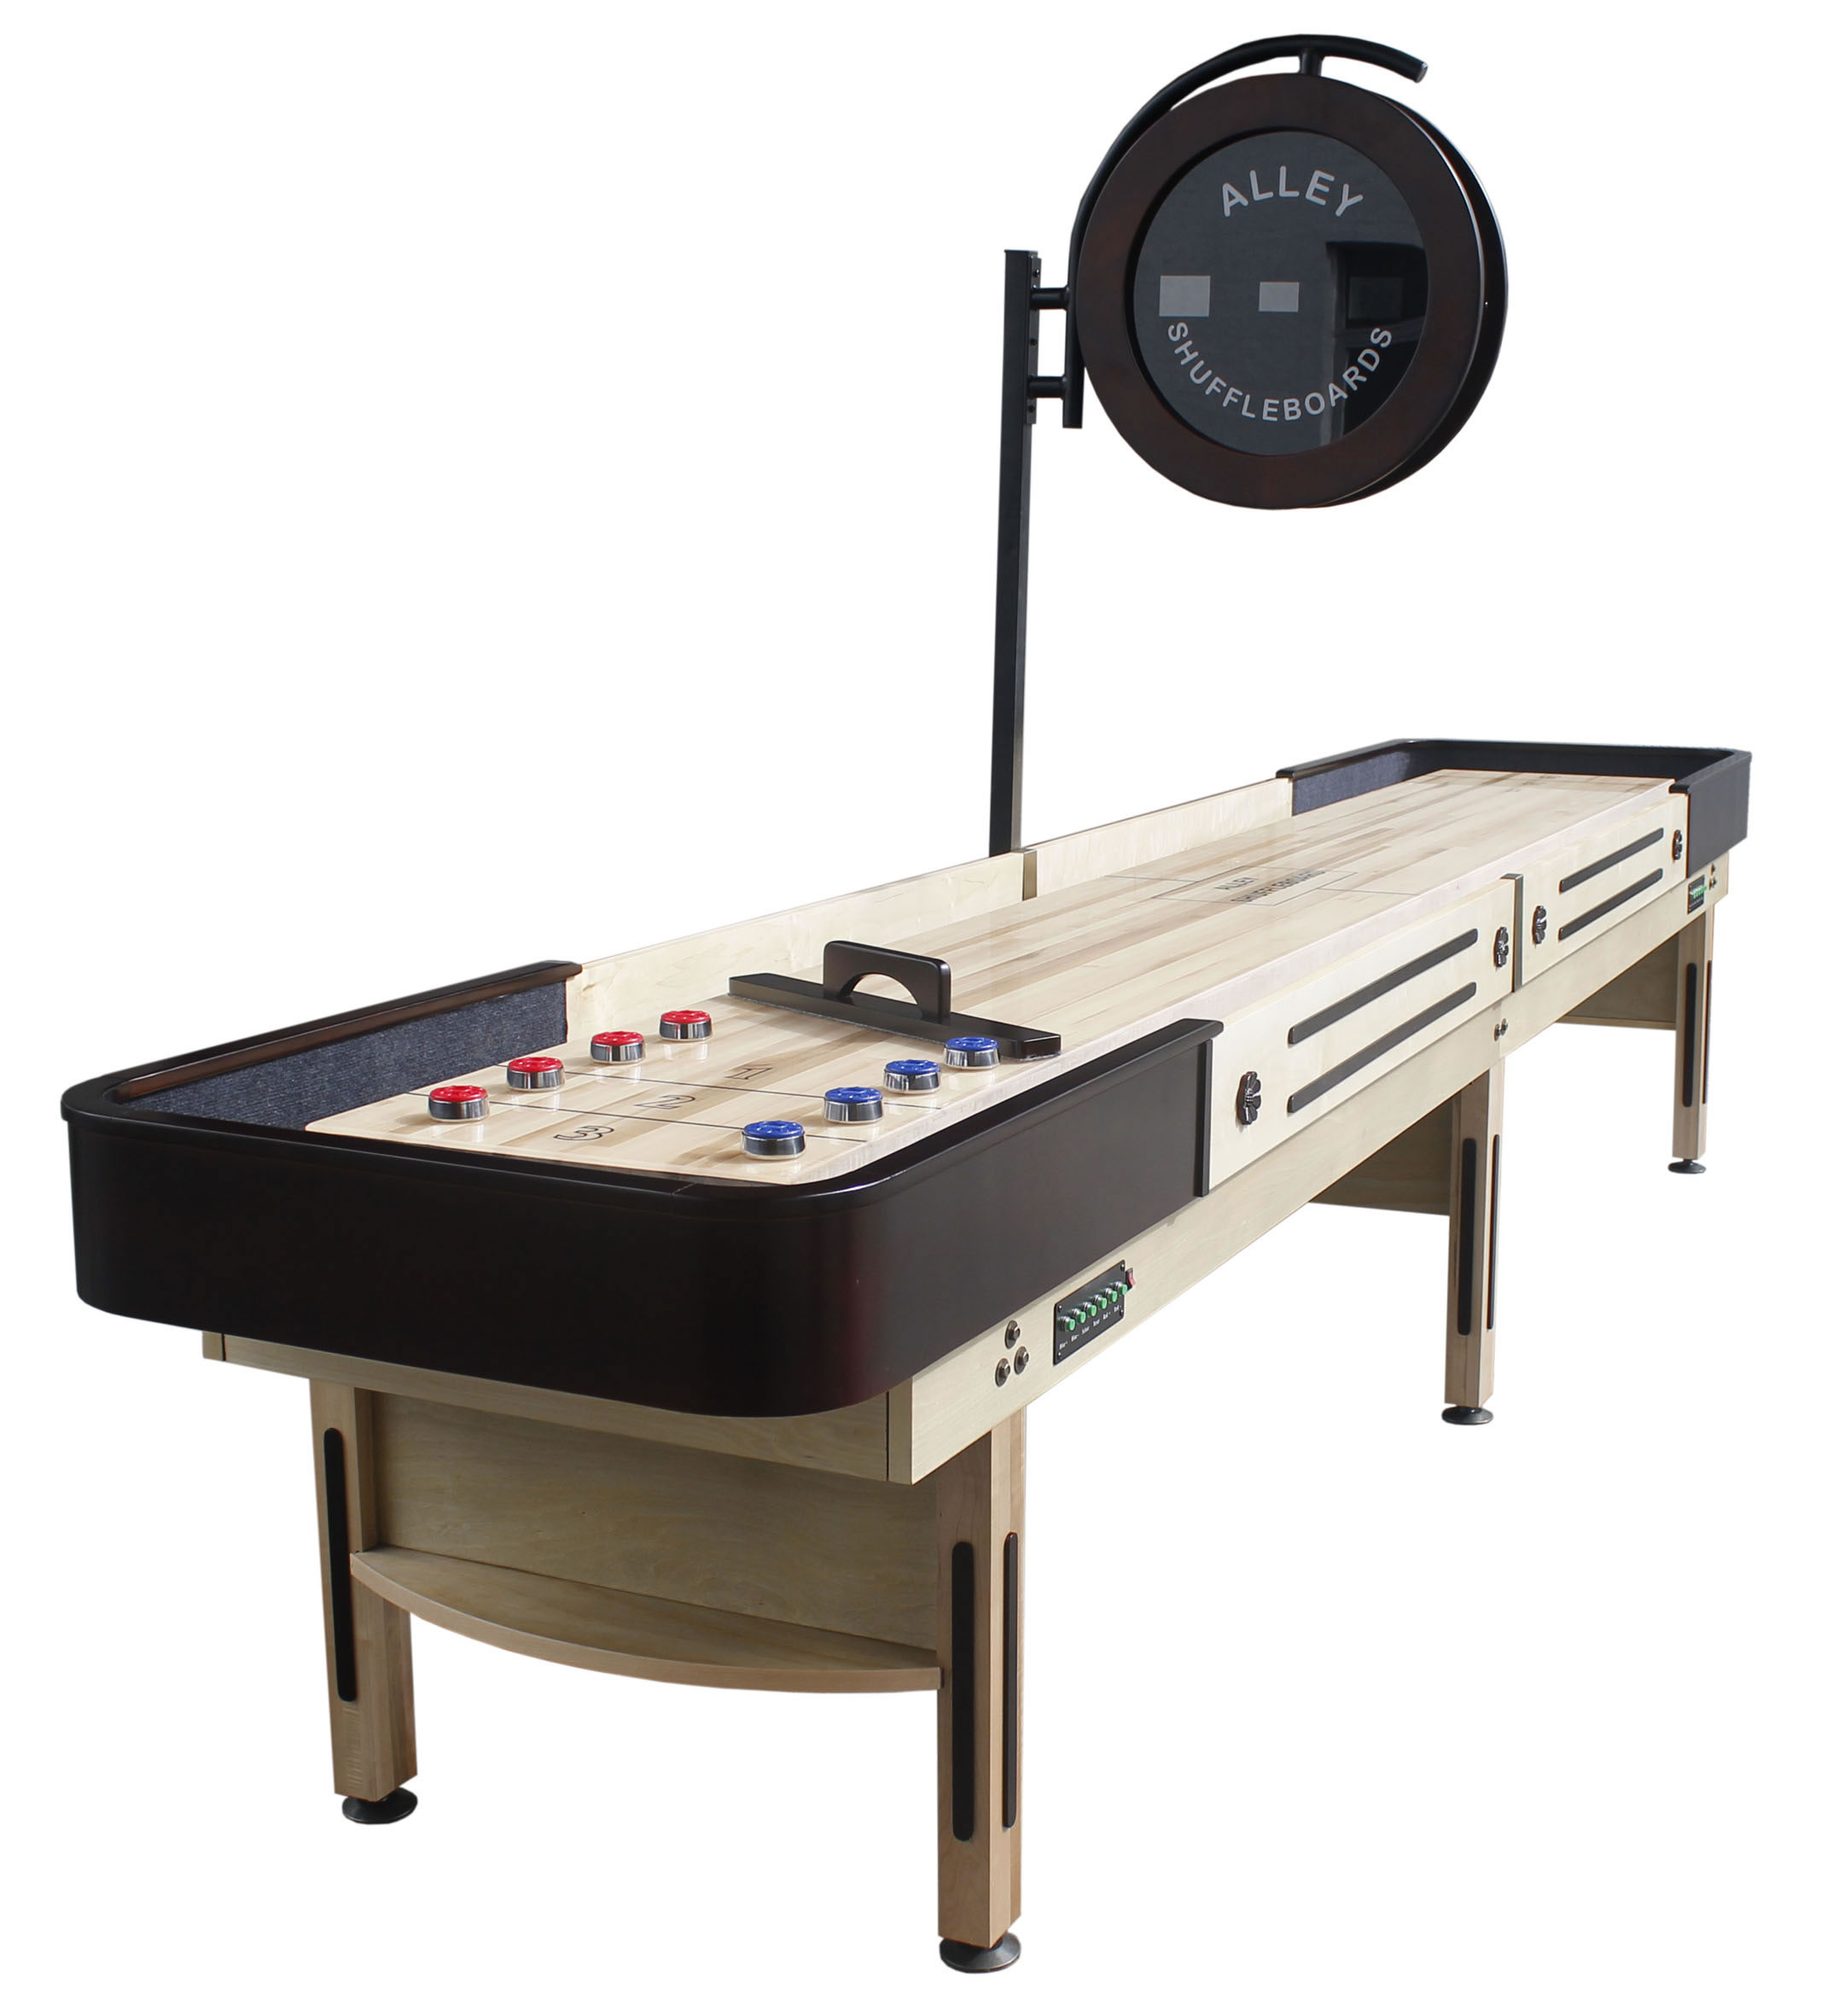 14' Alley Shuffleboard optional scoring unit